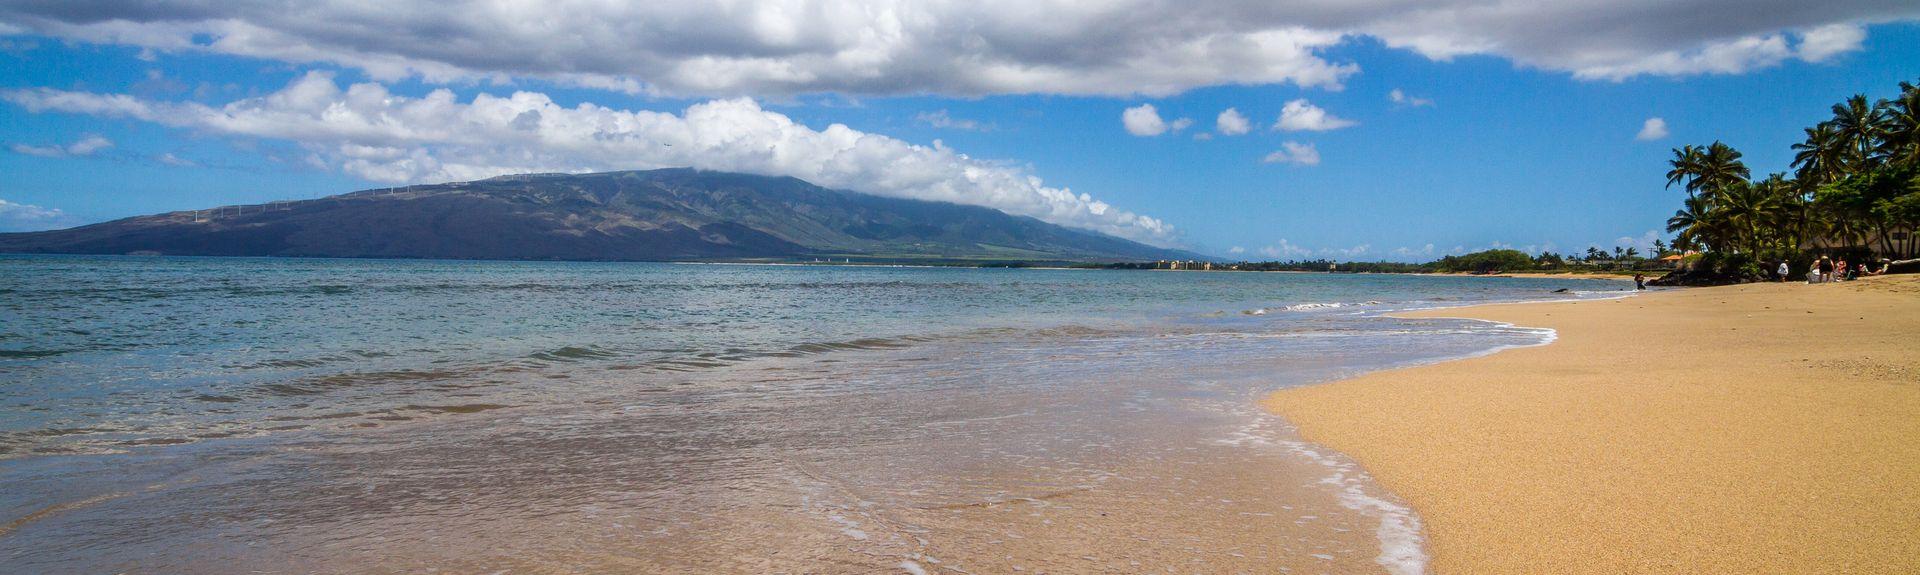 Kihei Resort, Kihei, Hawaii, United States of America